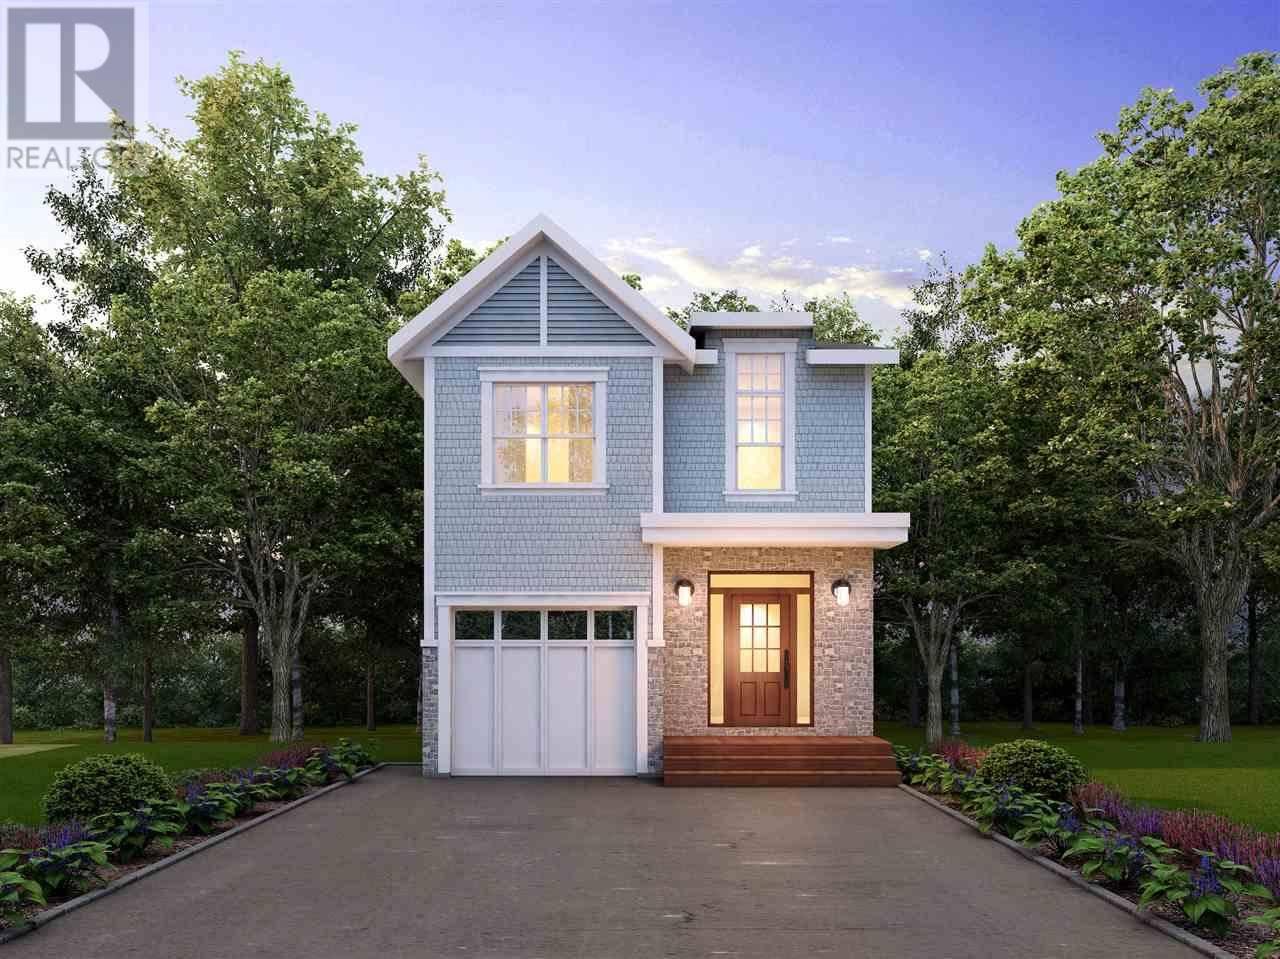 House for sale at 31 Darjeeling Dr Unit 423 Halifax Nova Scotia - MLS: 202002141